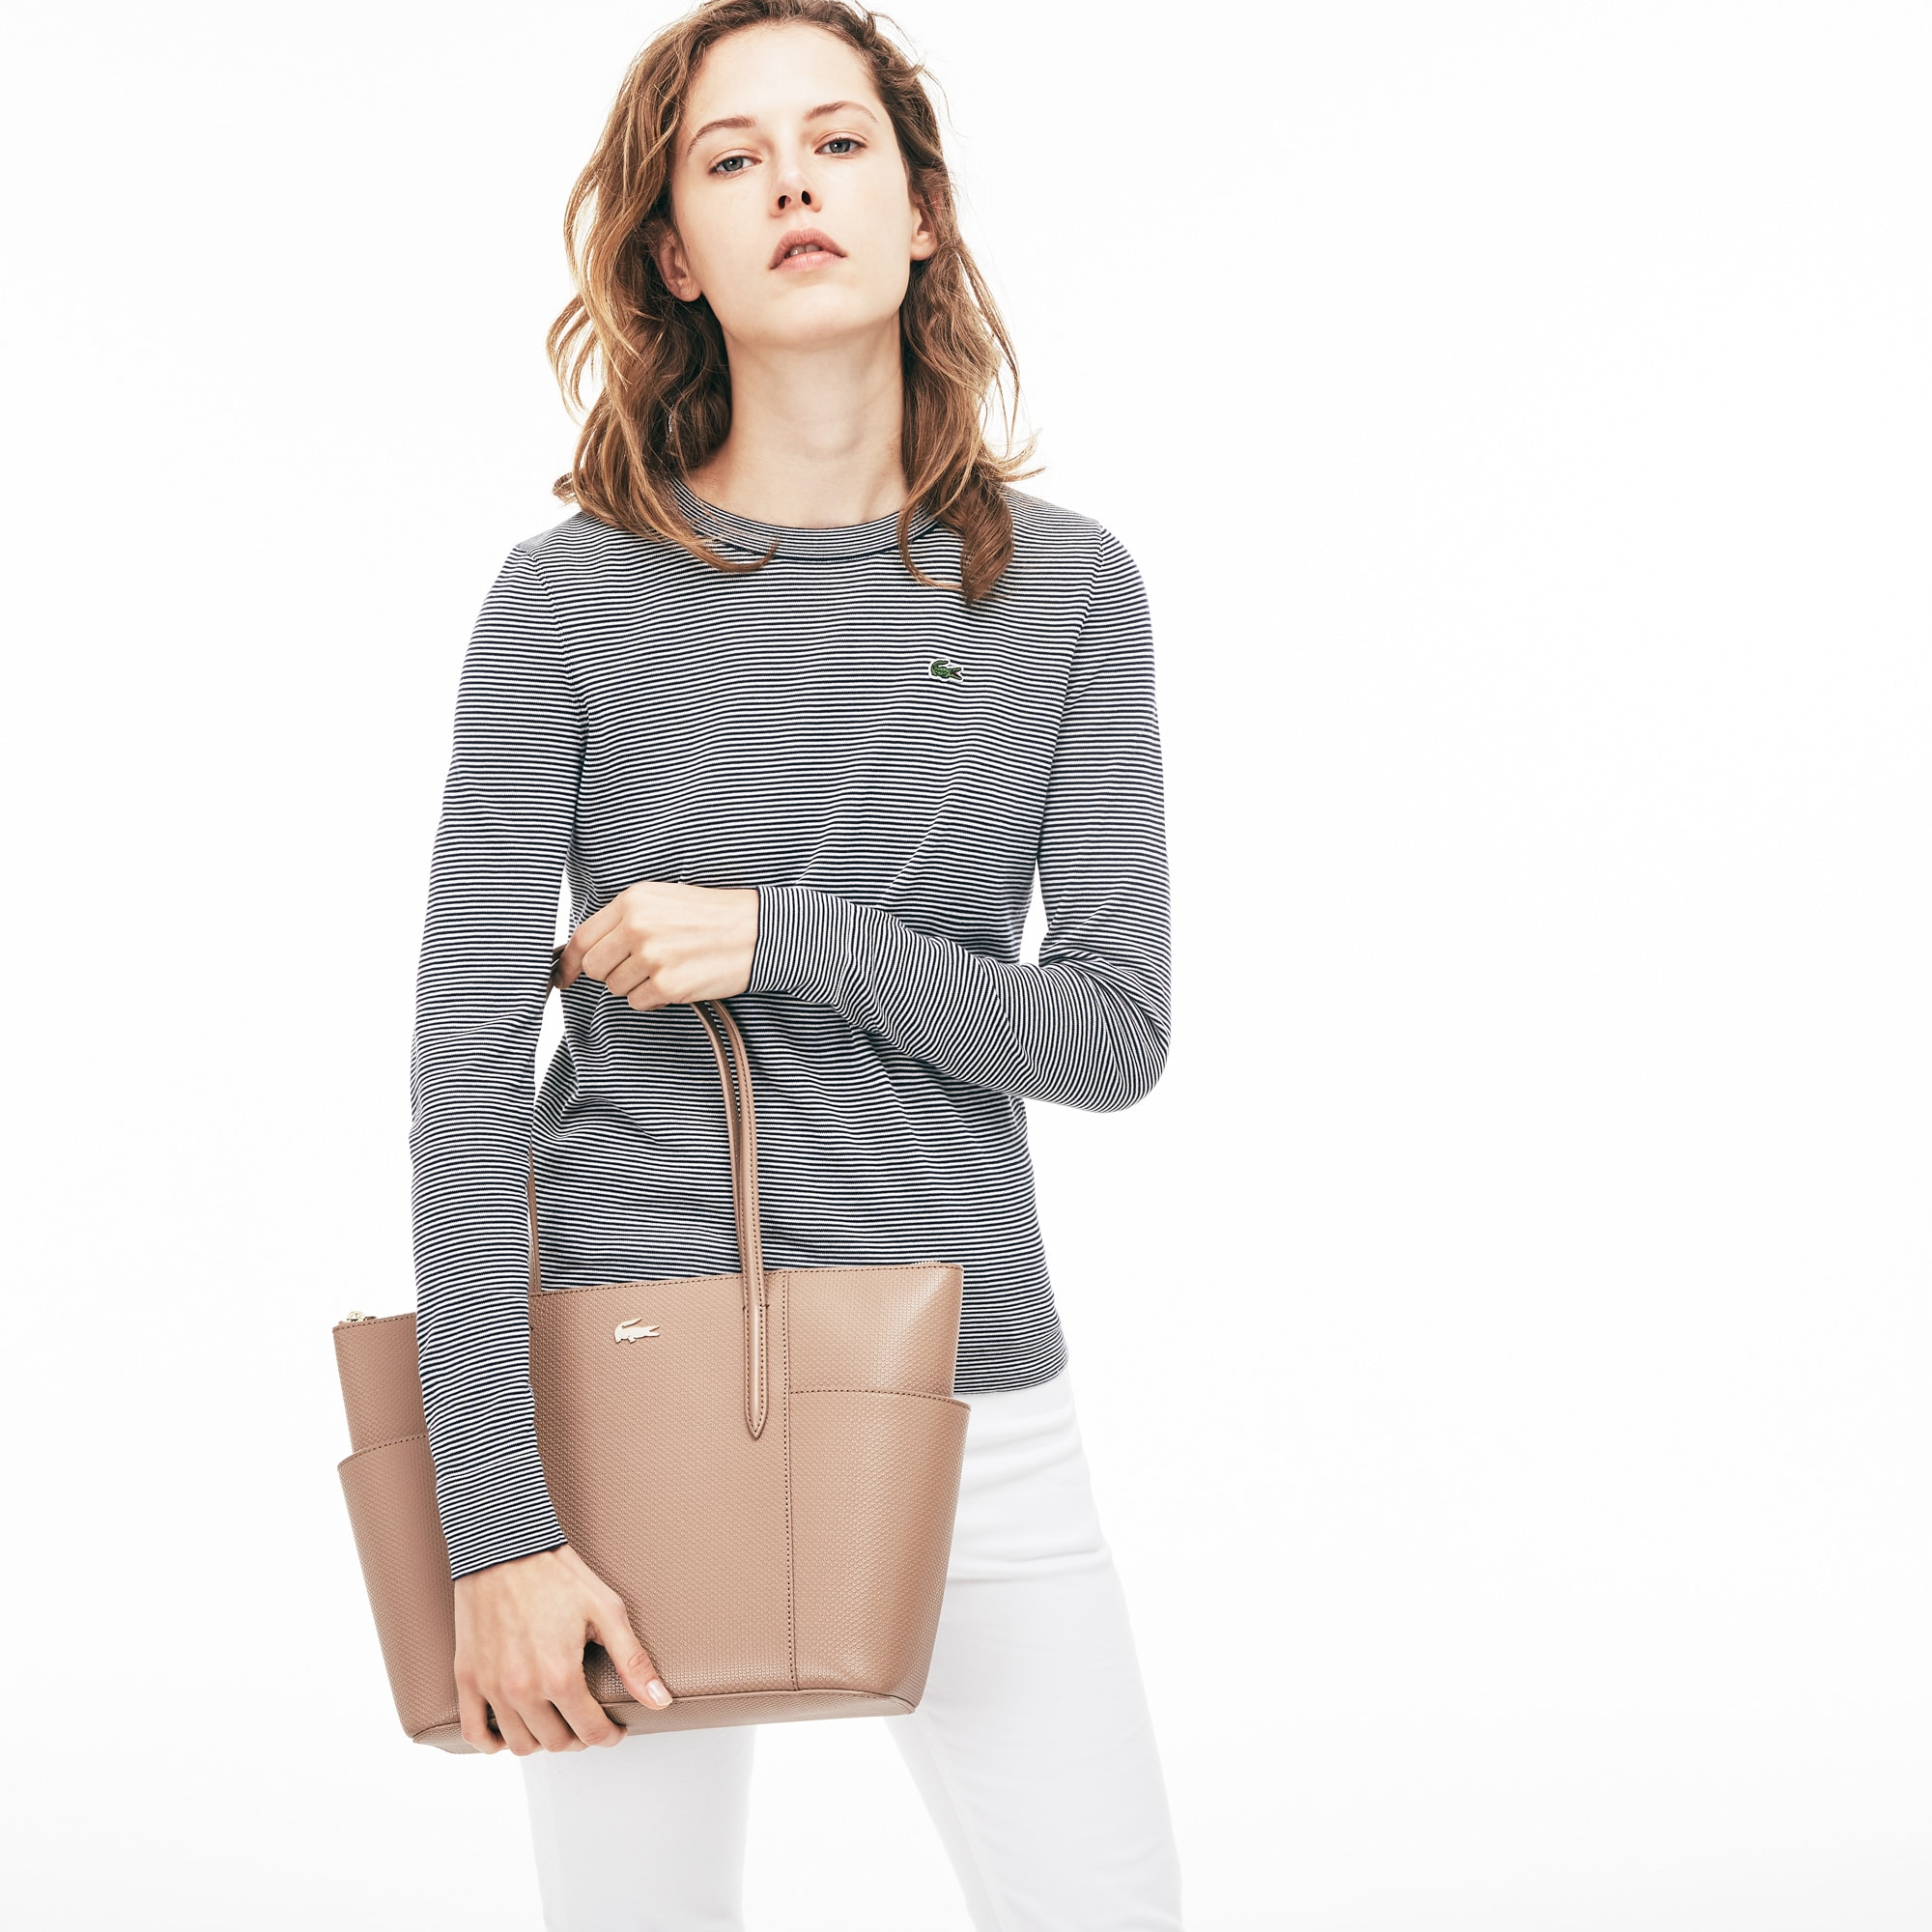 Women S Chantaco Piqué Leather Zip Pockets Tote